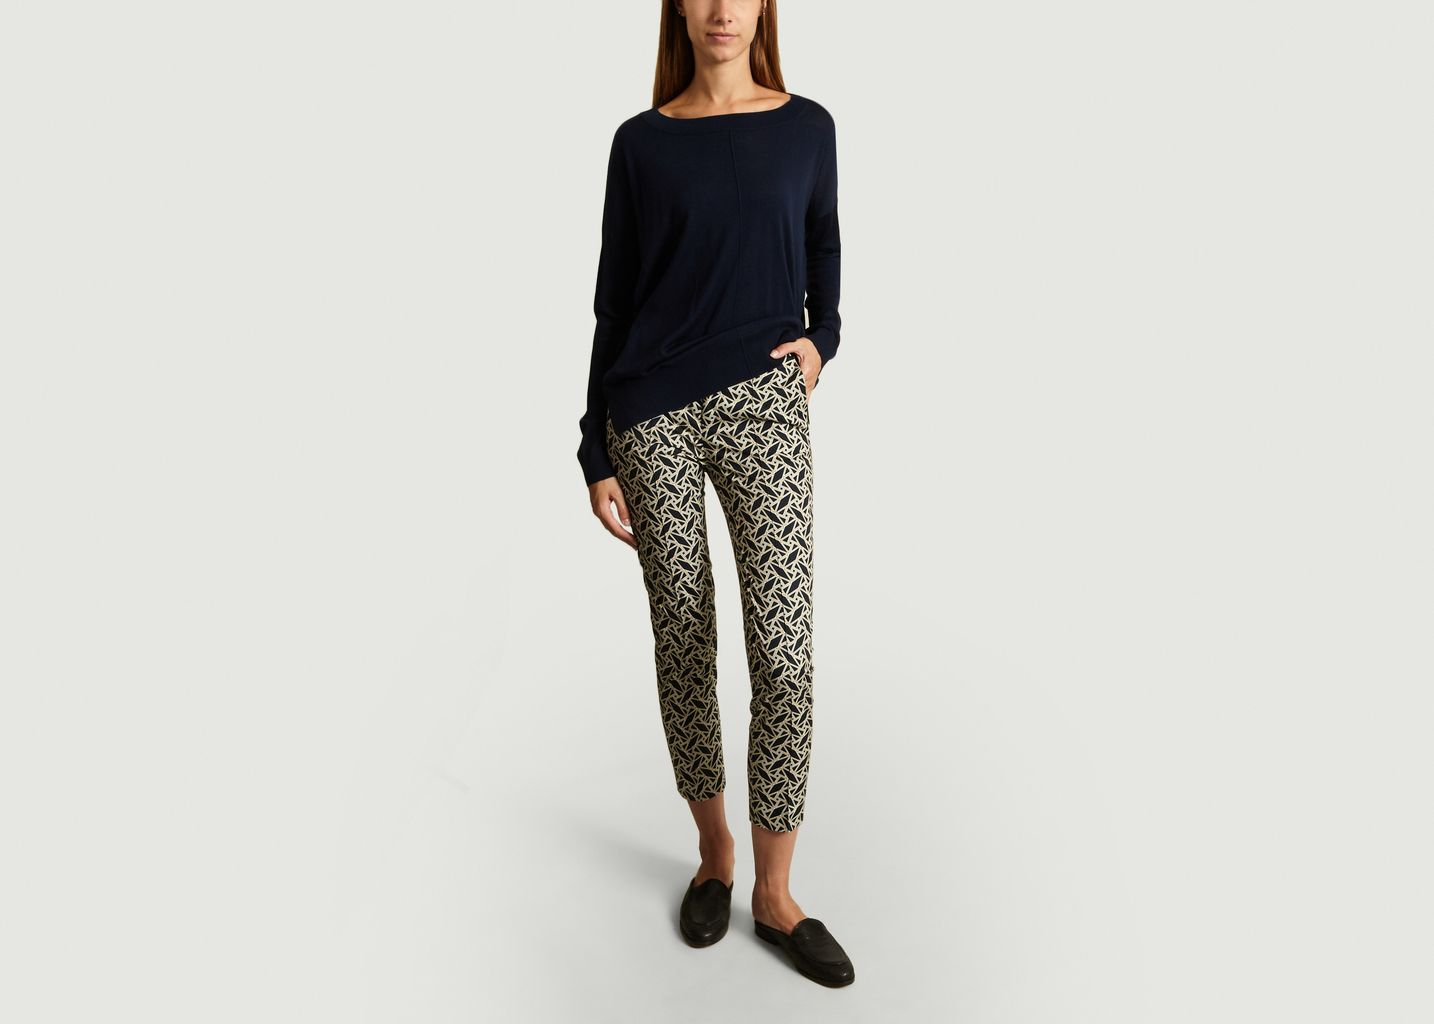 Pantalon Priscille - Chloé Stora